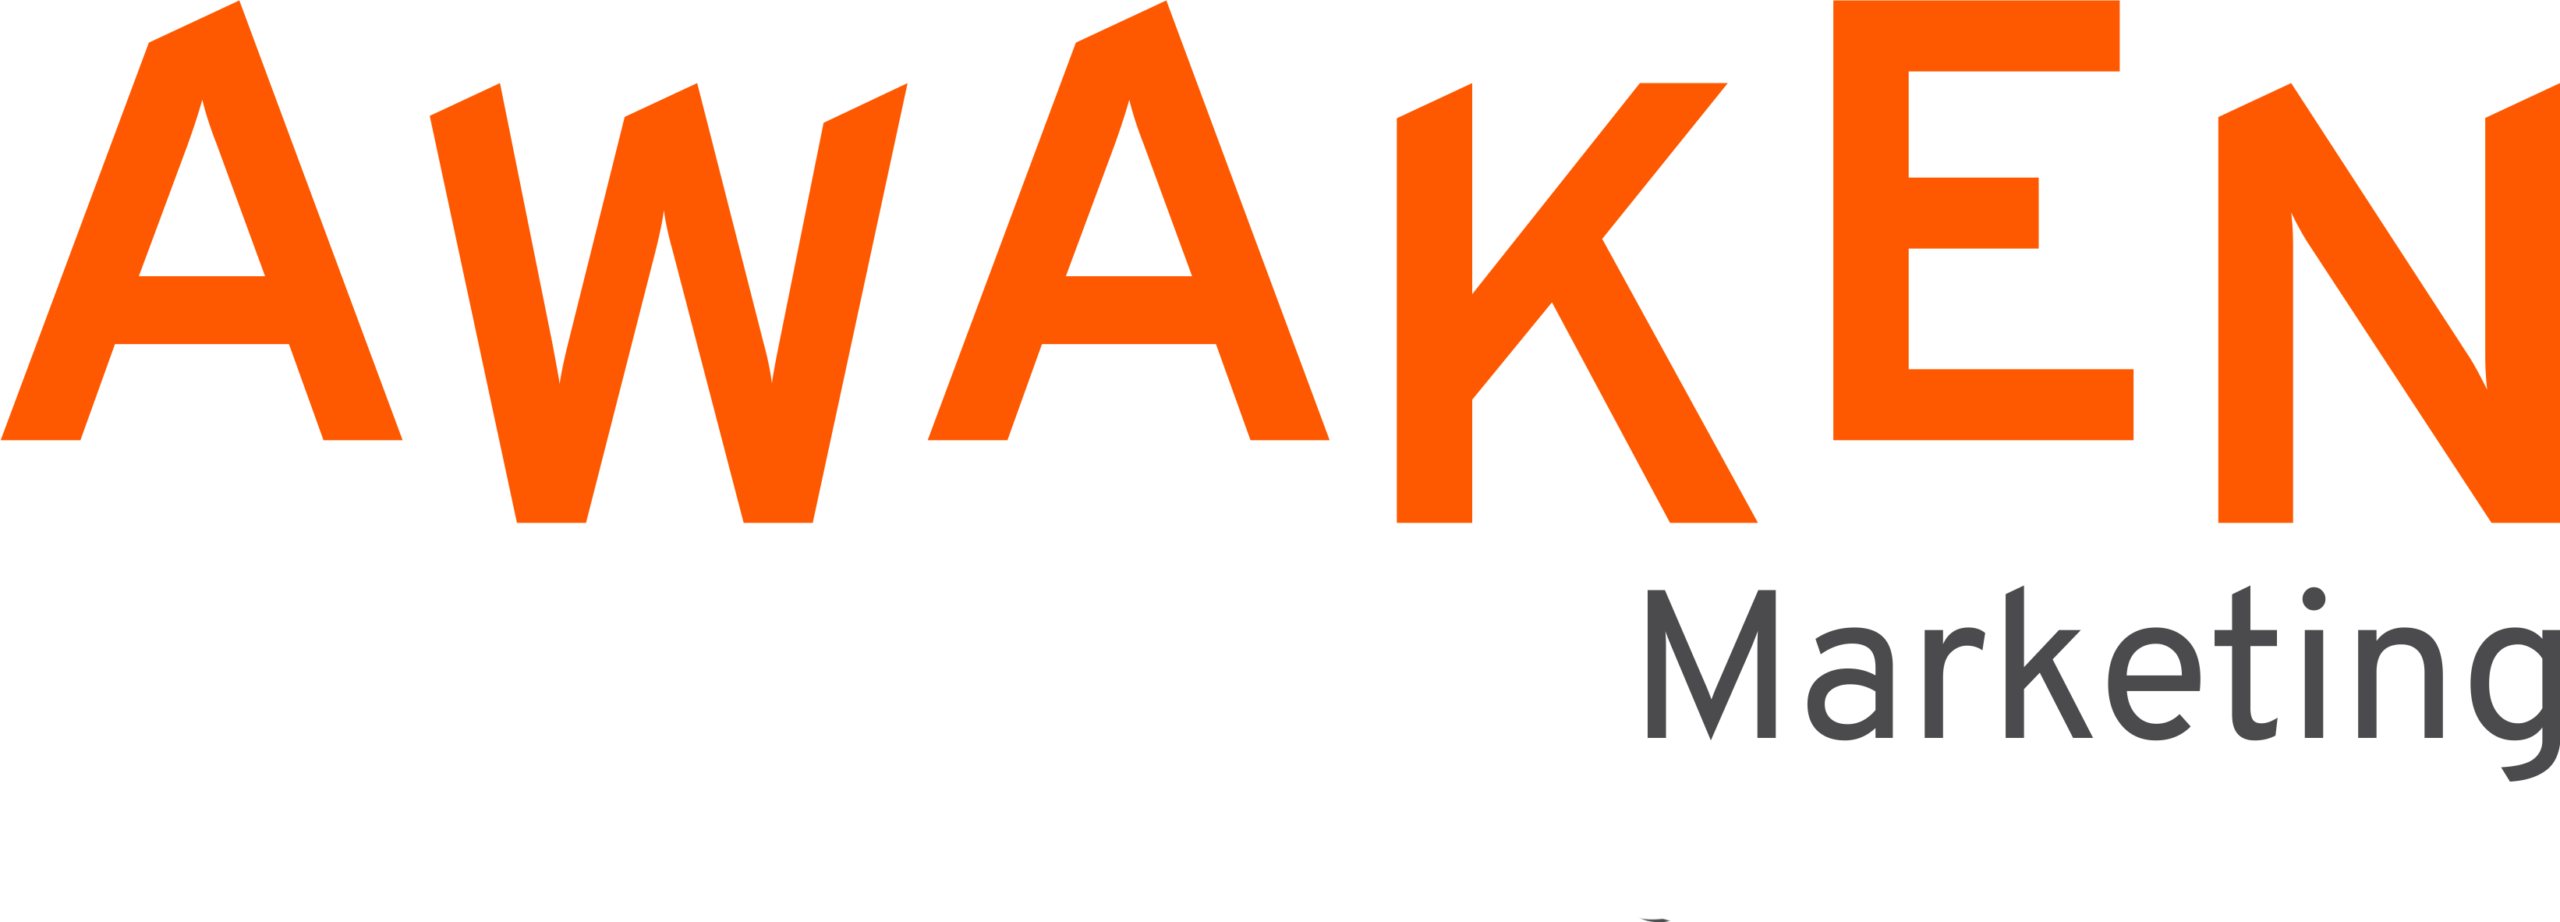 Awaken Marketing